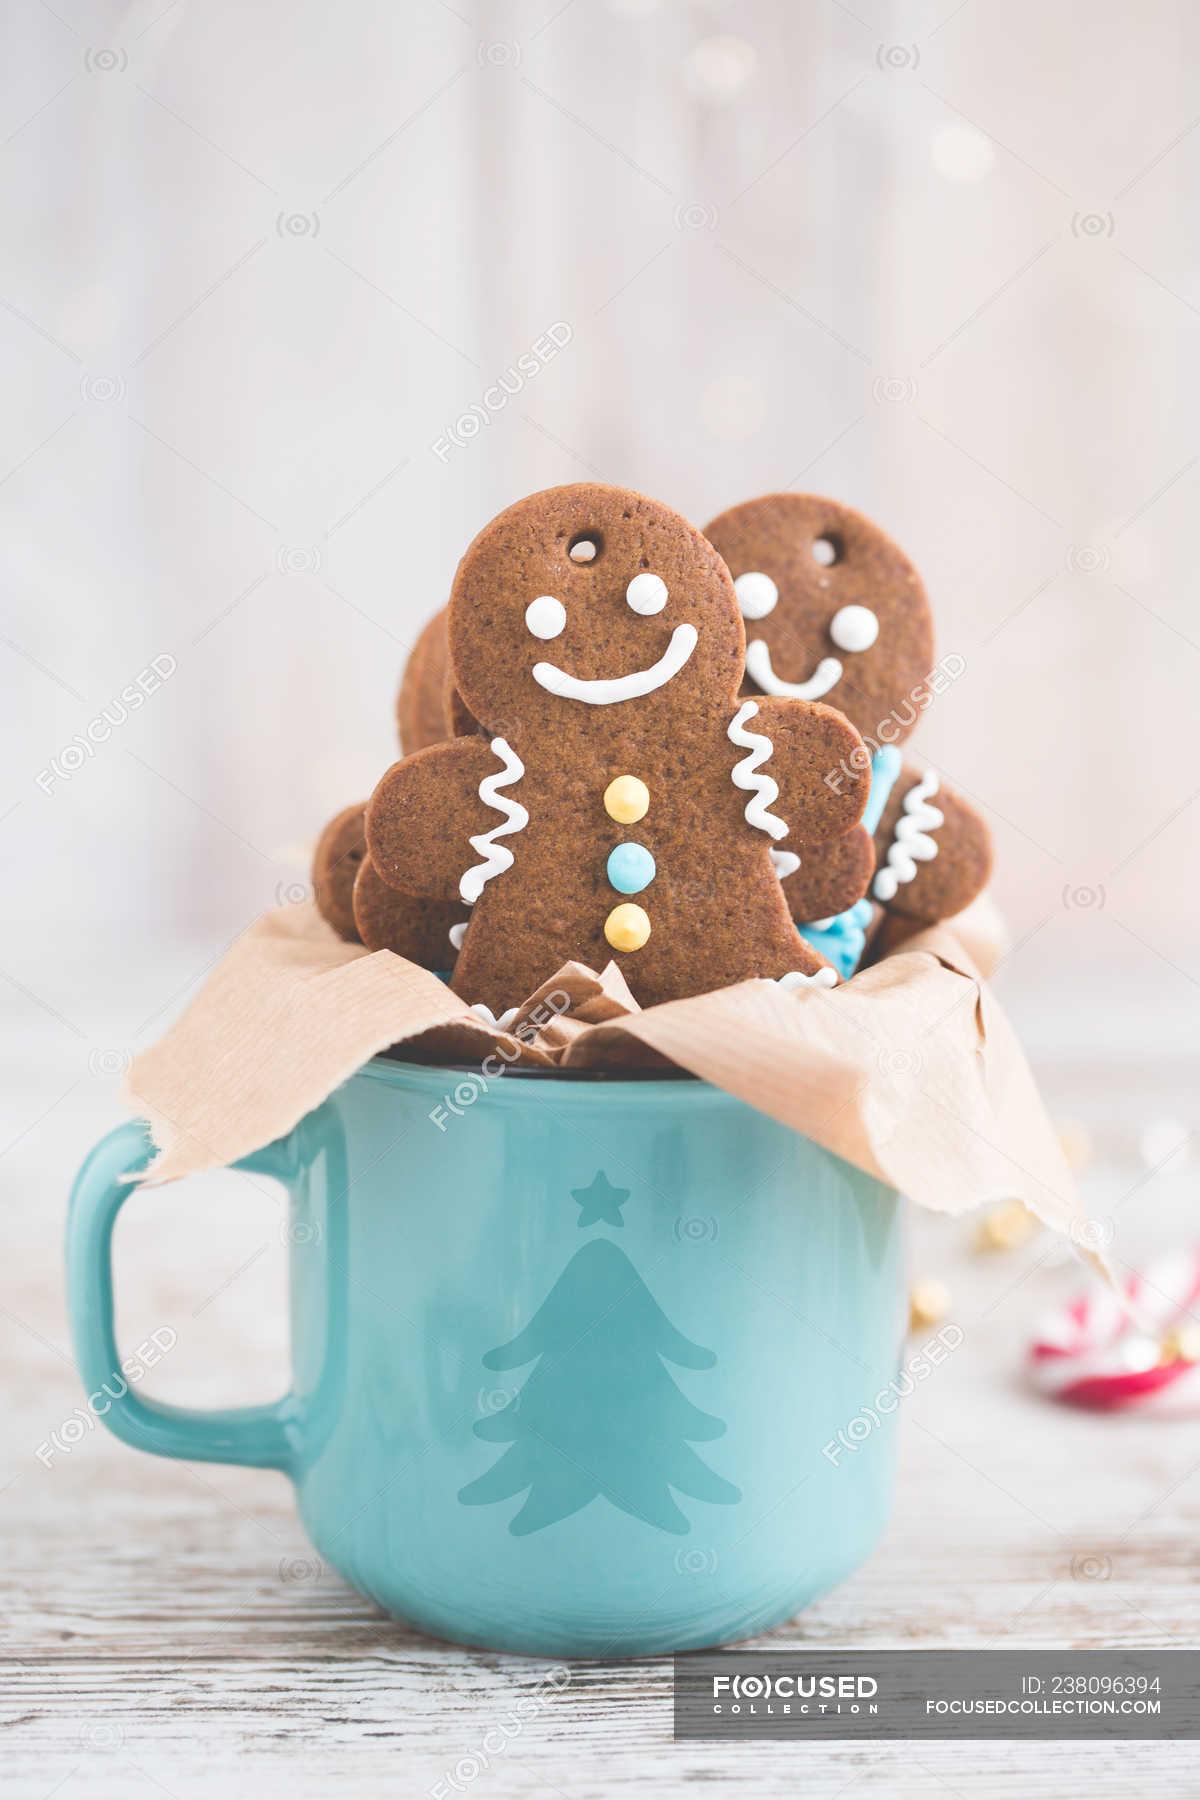 Gingerbread Man Cookies In A Christmas Mug Freshness Human Representation Stock Photo 238096394